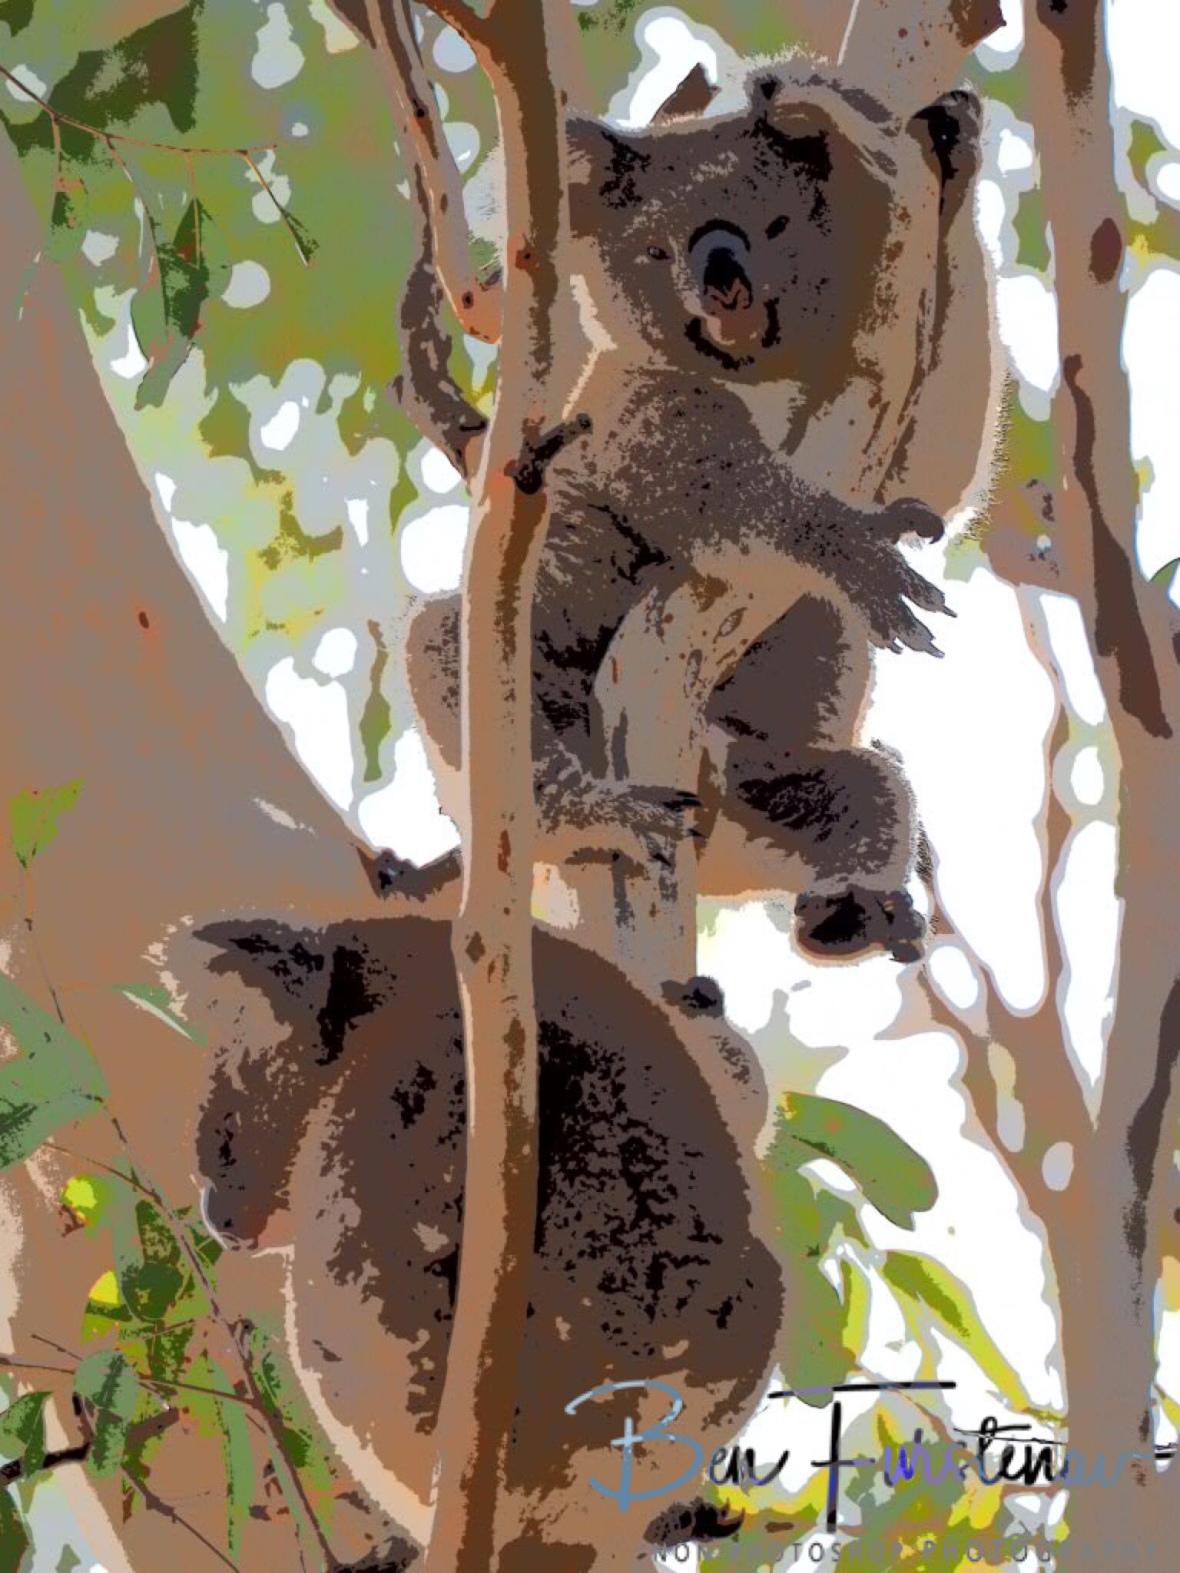 Sulking suckling at Woodburn, Northern New South Wales, Australia